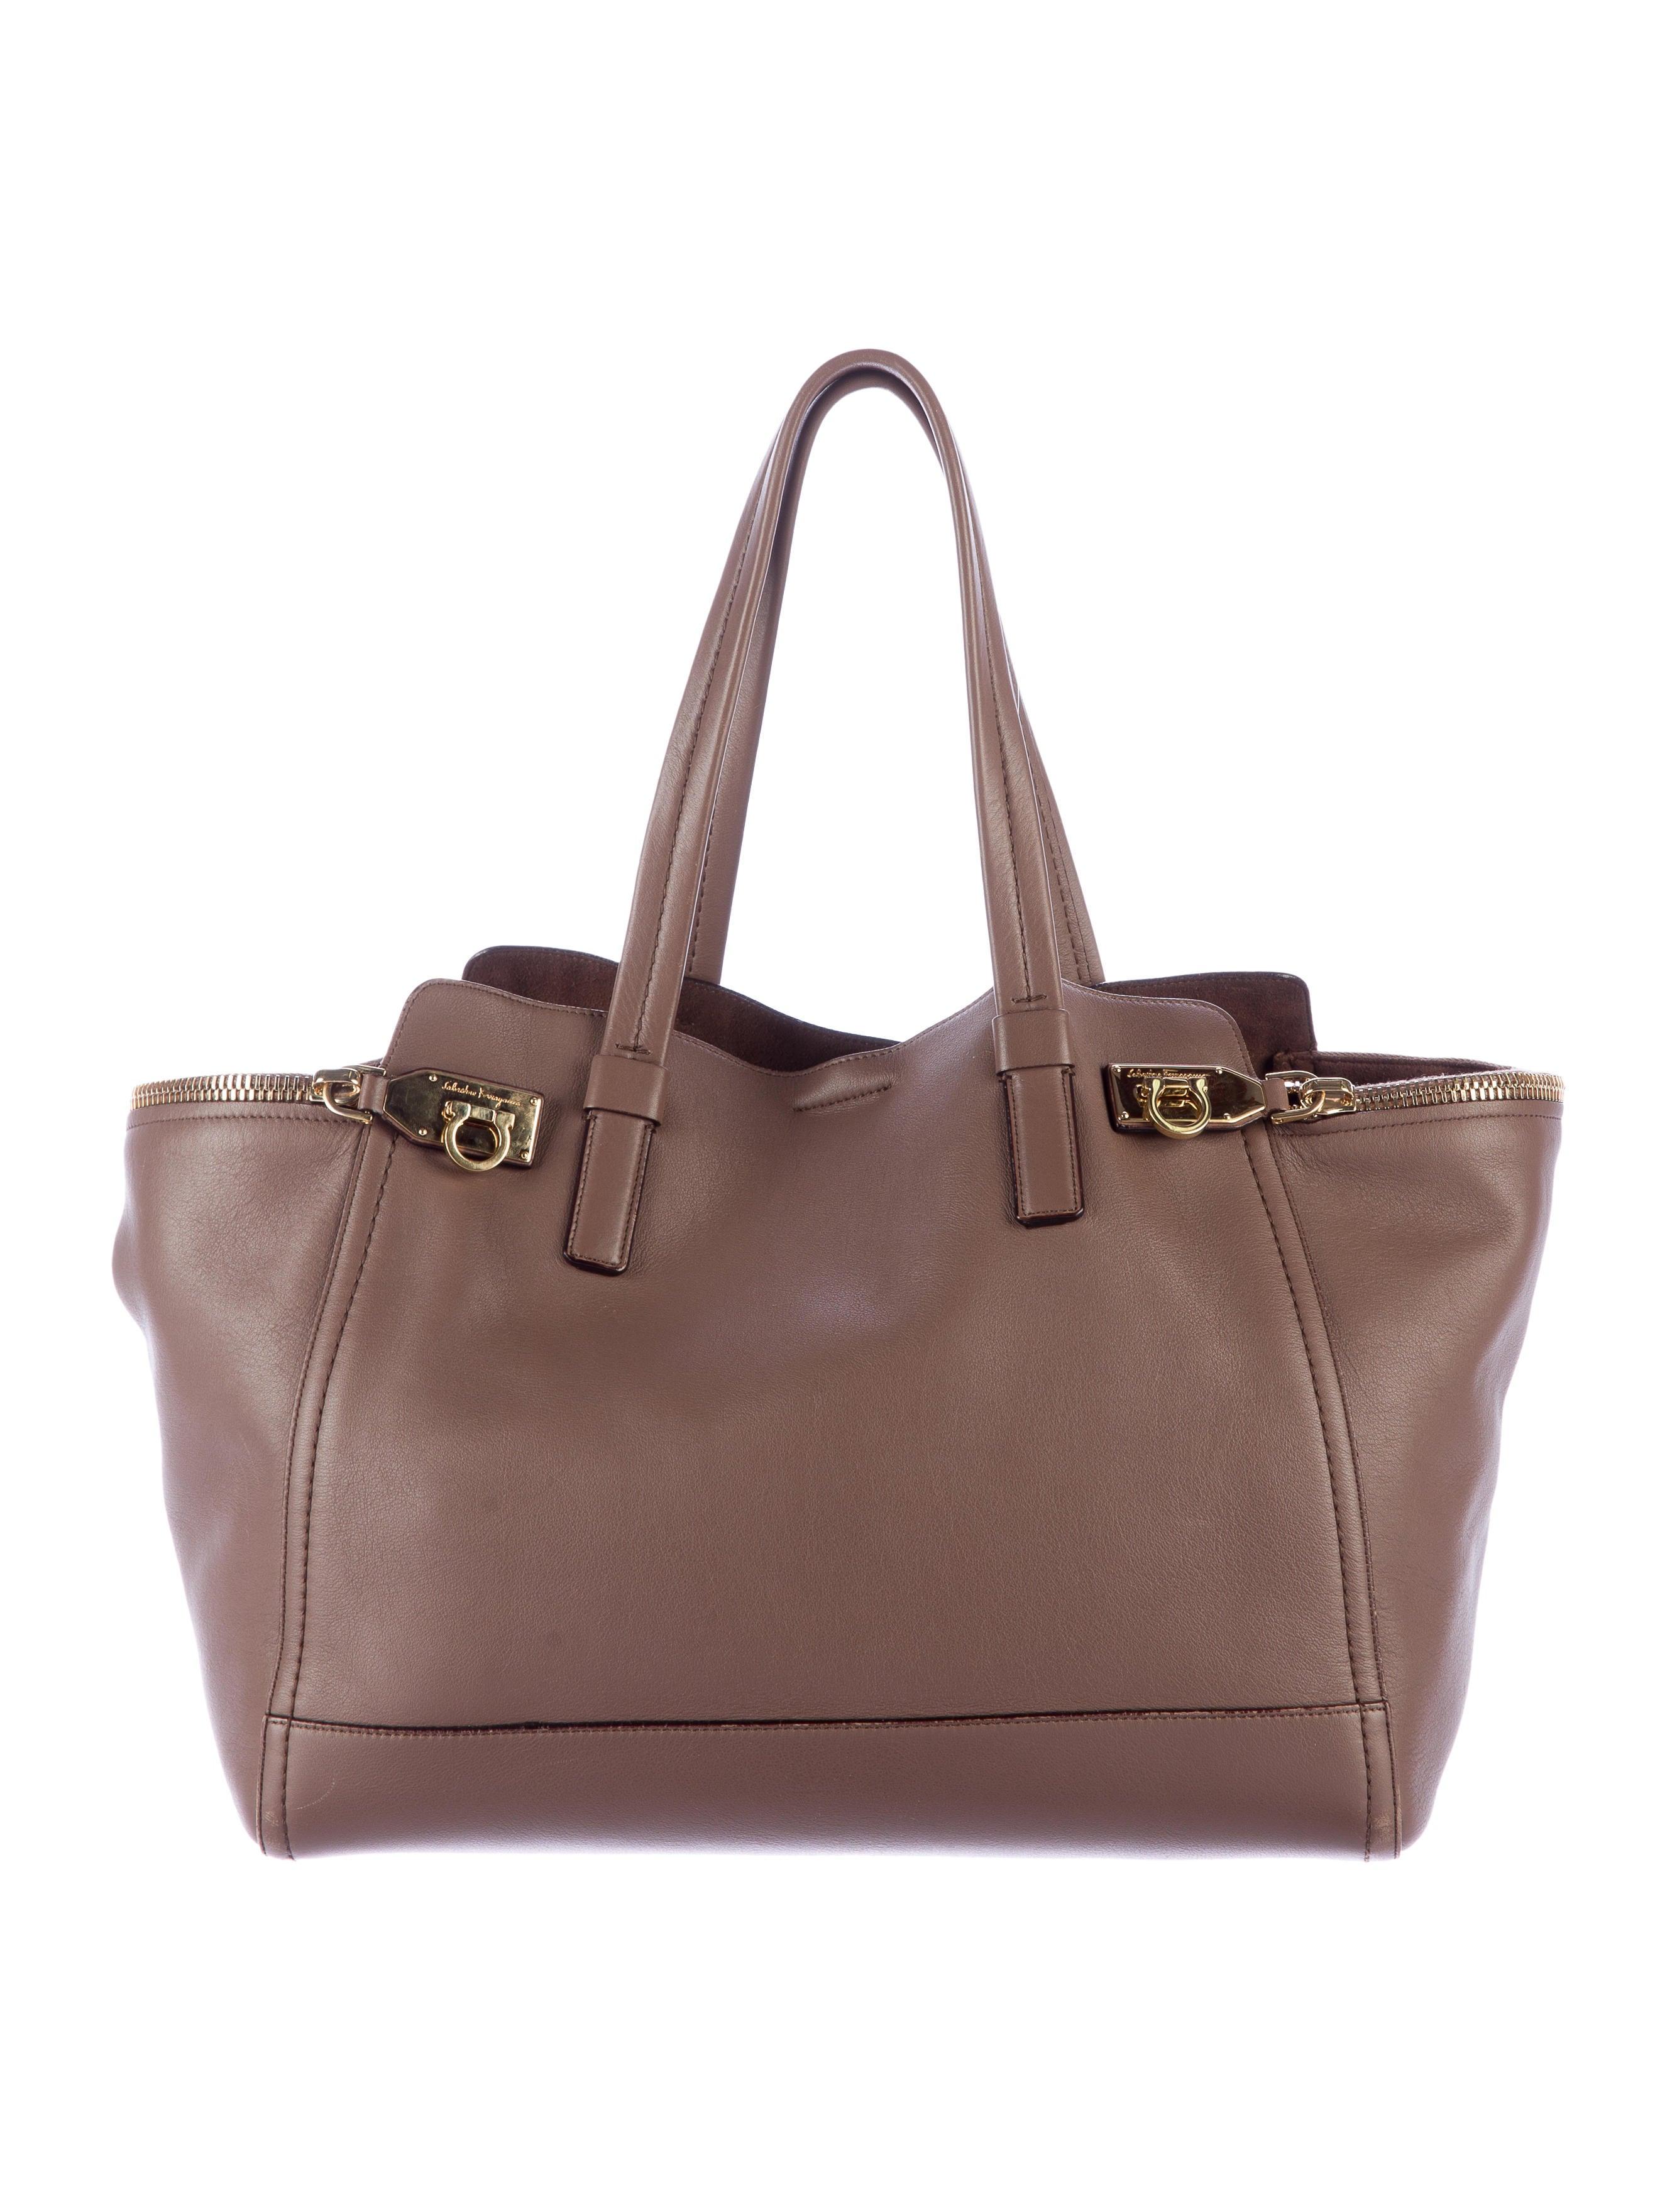 5a39d56b25 Salvatore Ferragamo Verve Leather Tote - Handbags - SAL41525